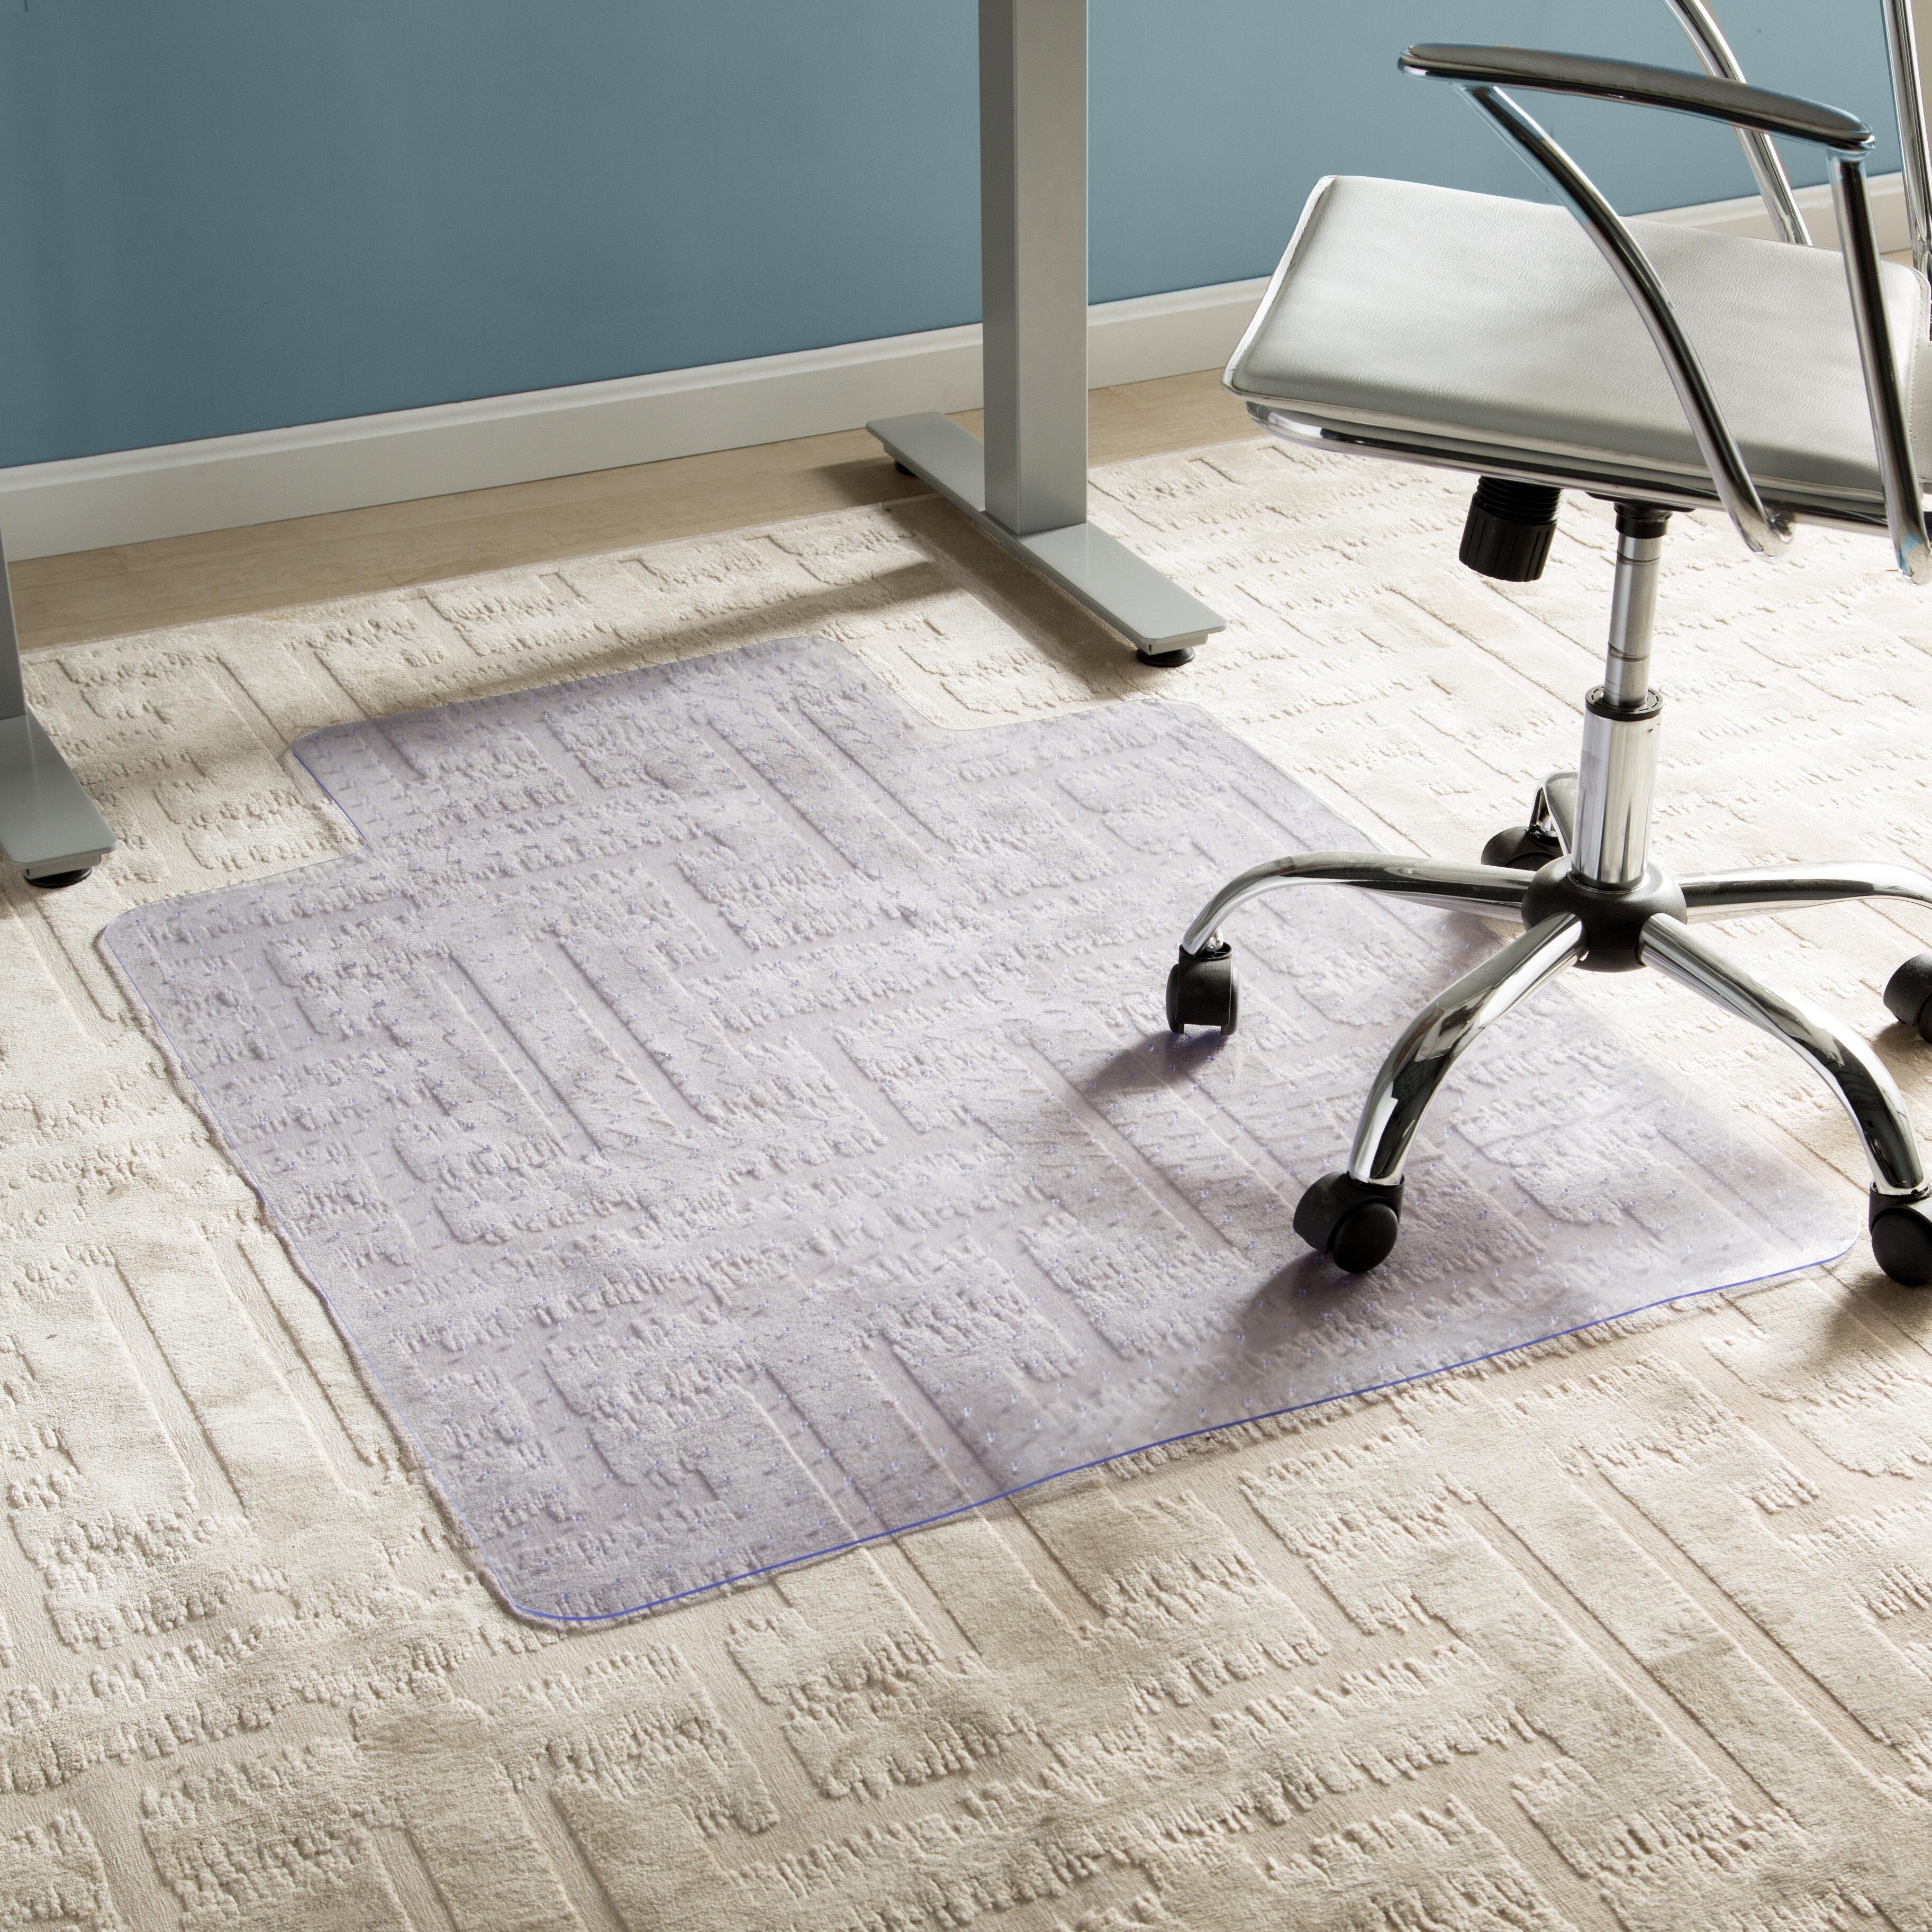 Wayfair Basics Office Low Pile Carpet Straight Edge Chair Mat Reviews